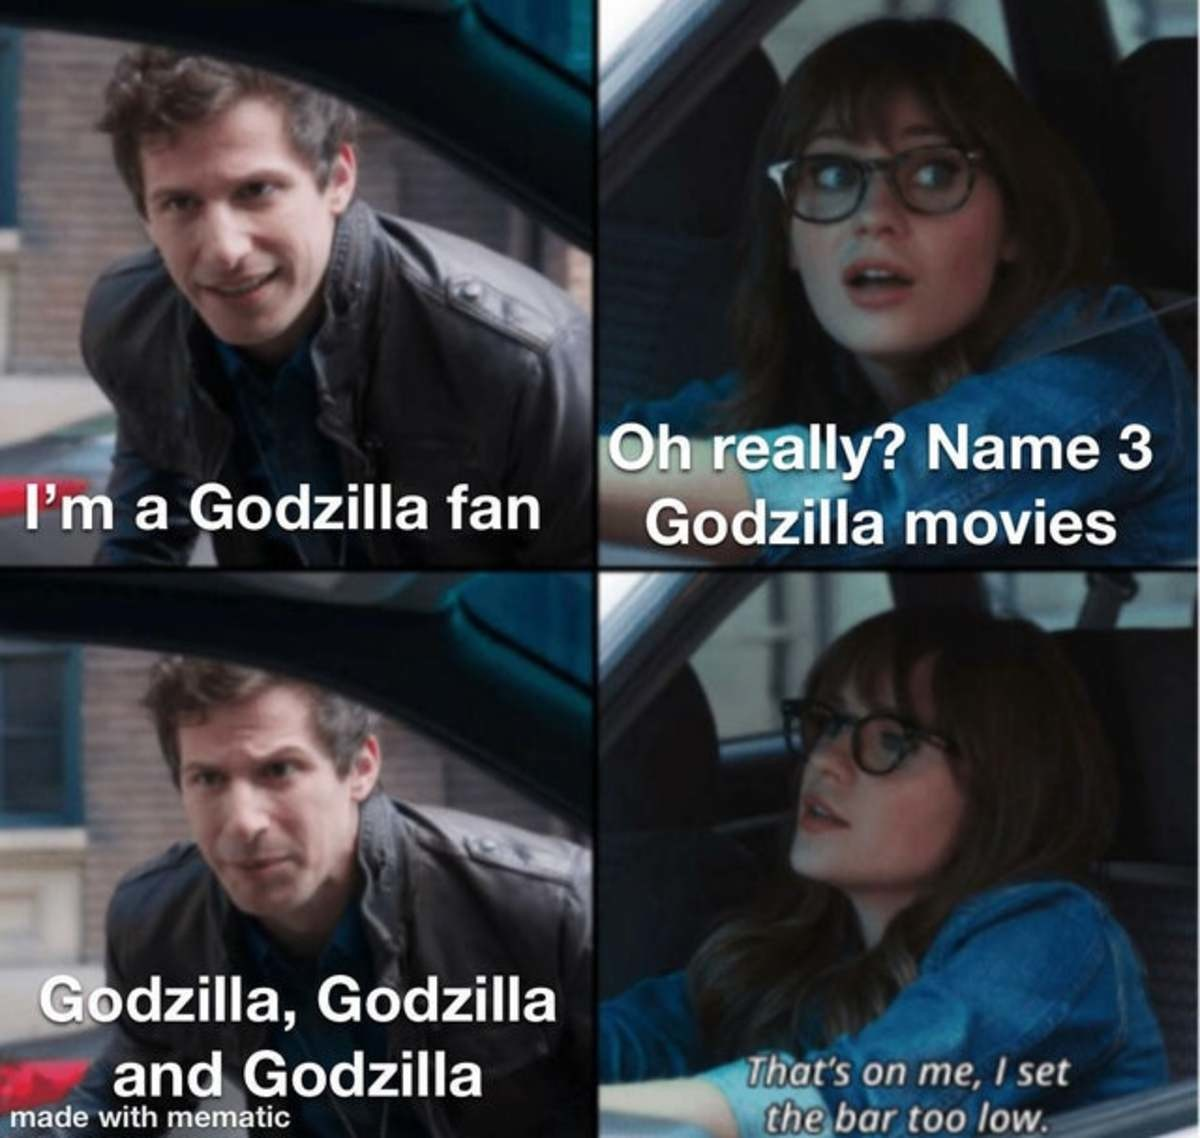 lavish Idiots. Not mine, sauce: thistemplateonrmemesandfounditpretty/.. Gozilla VS the Smog Monster, Godzilla: Tokyo S.O.S., Godzilla: Final Wars, Godzilla 2000, Godzilla VS Biolante. I could continue.